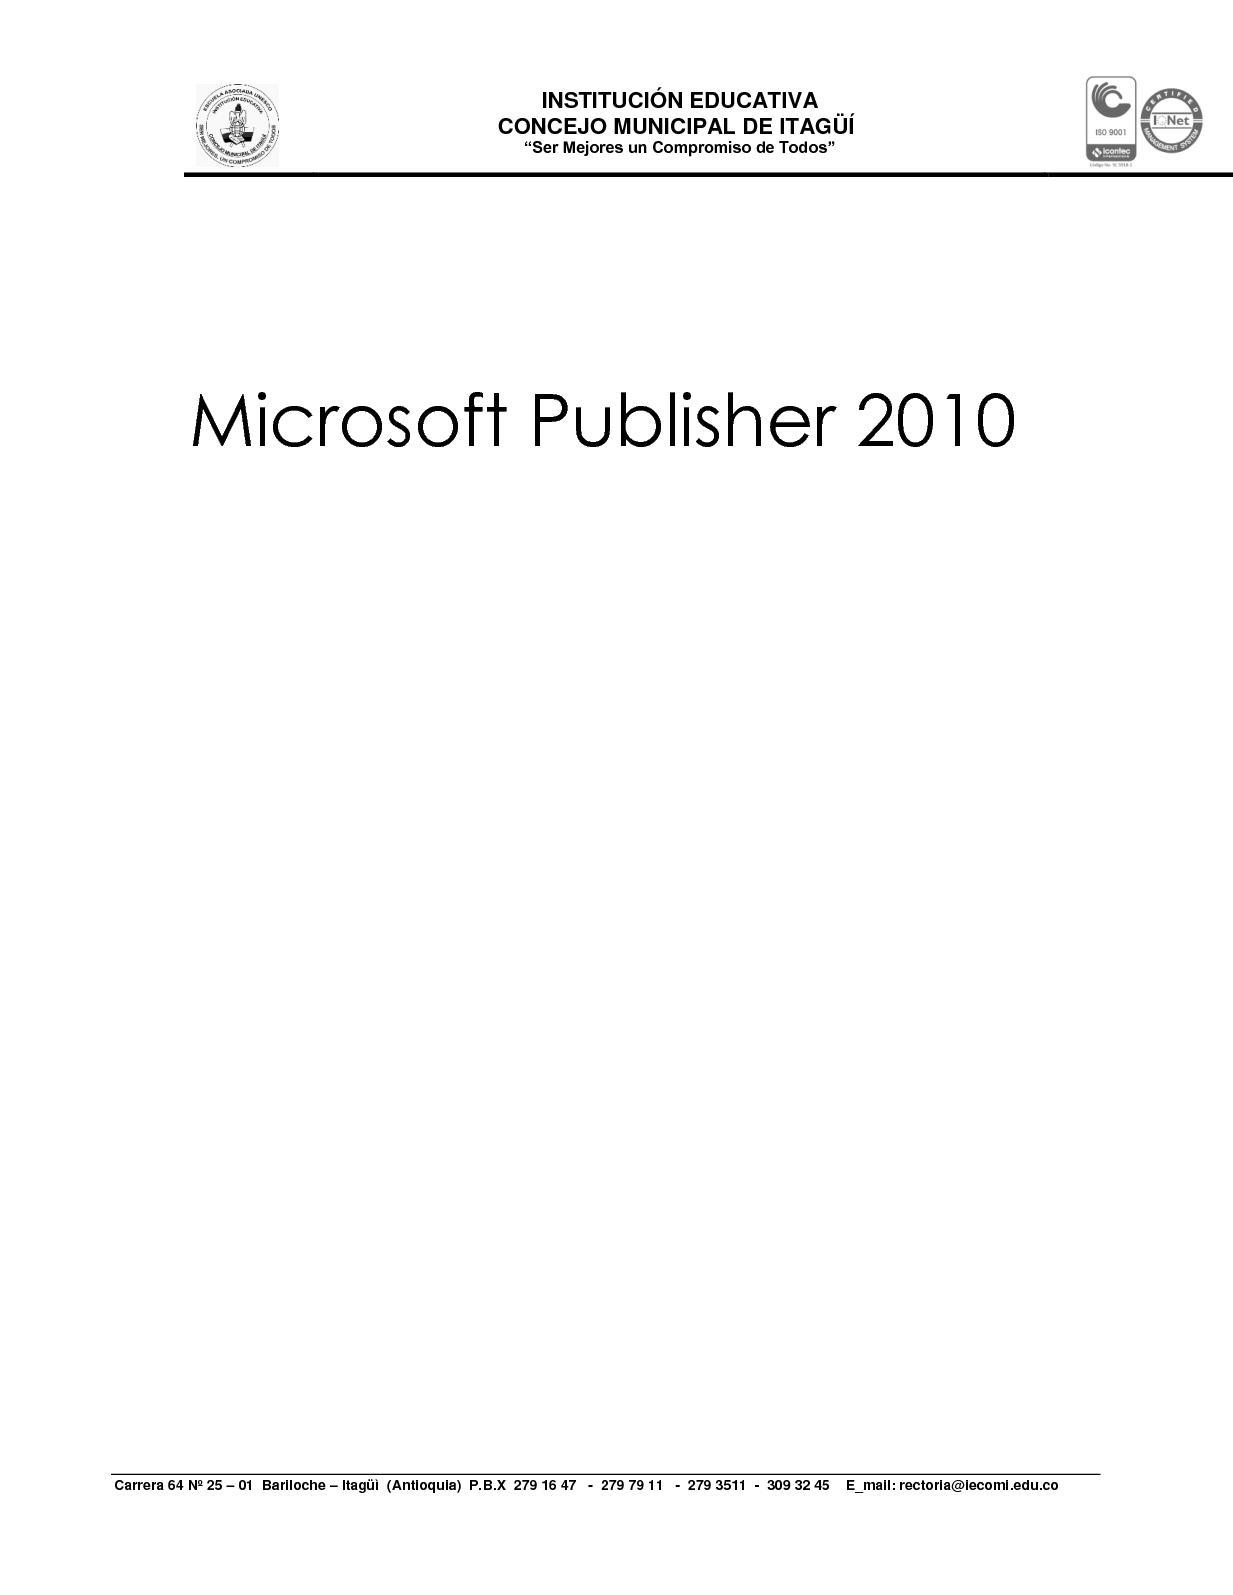 Calaméo - Microsoft Publisher 2010 Guía Del Producto (1)